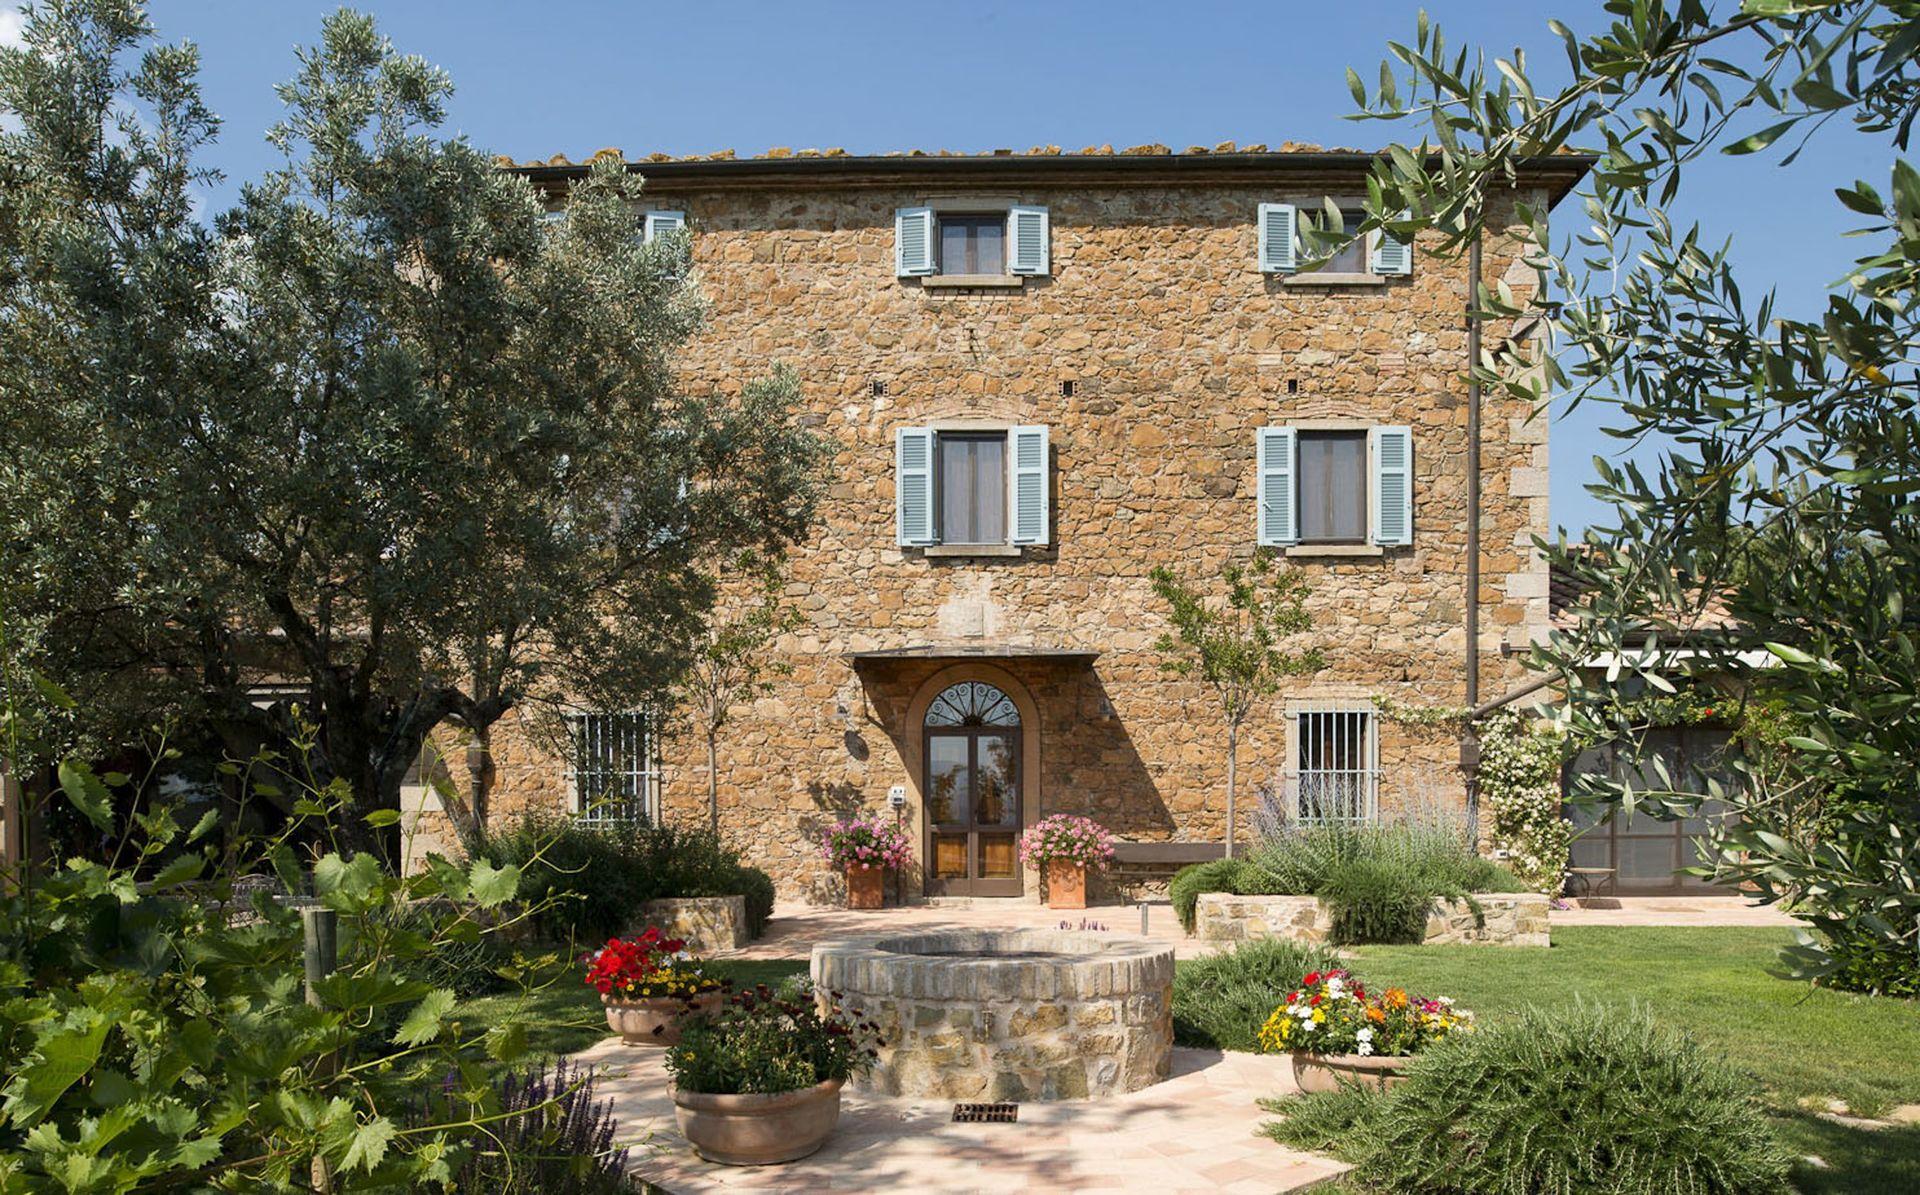 Tatti Villa Vacation Rental La Ghiandaia that sleeps 20